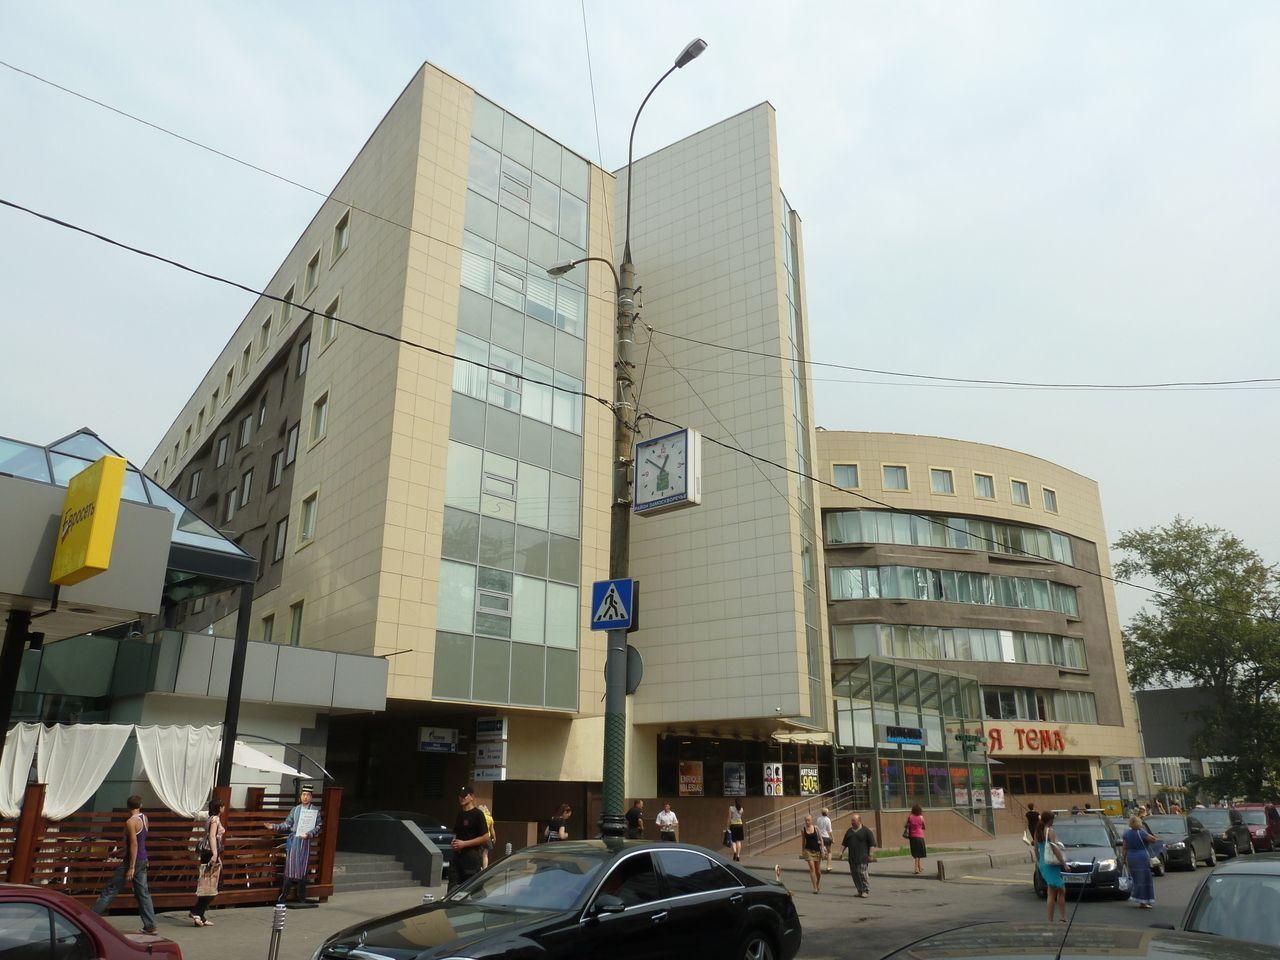 продажа помещений в БЦ Плеханов Плаза